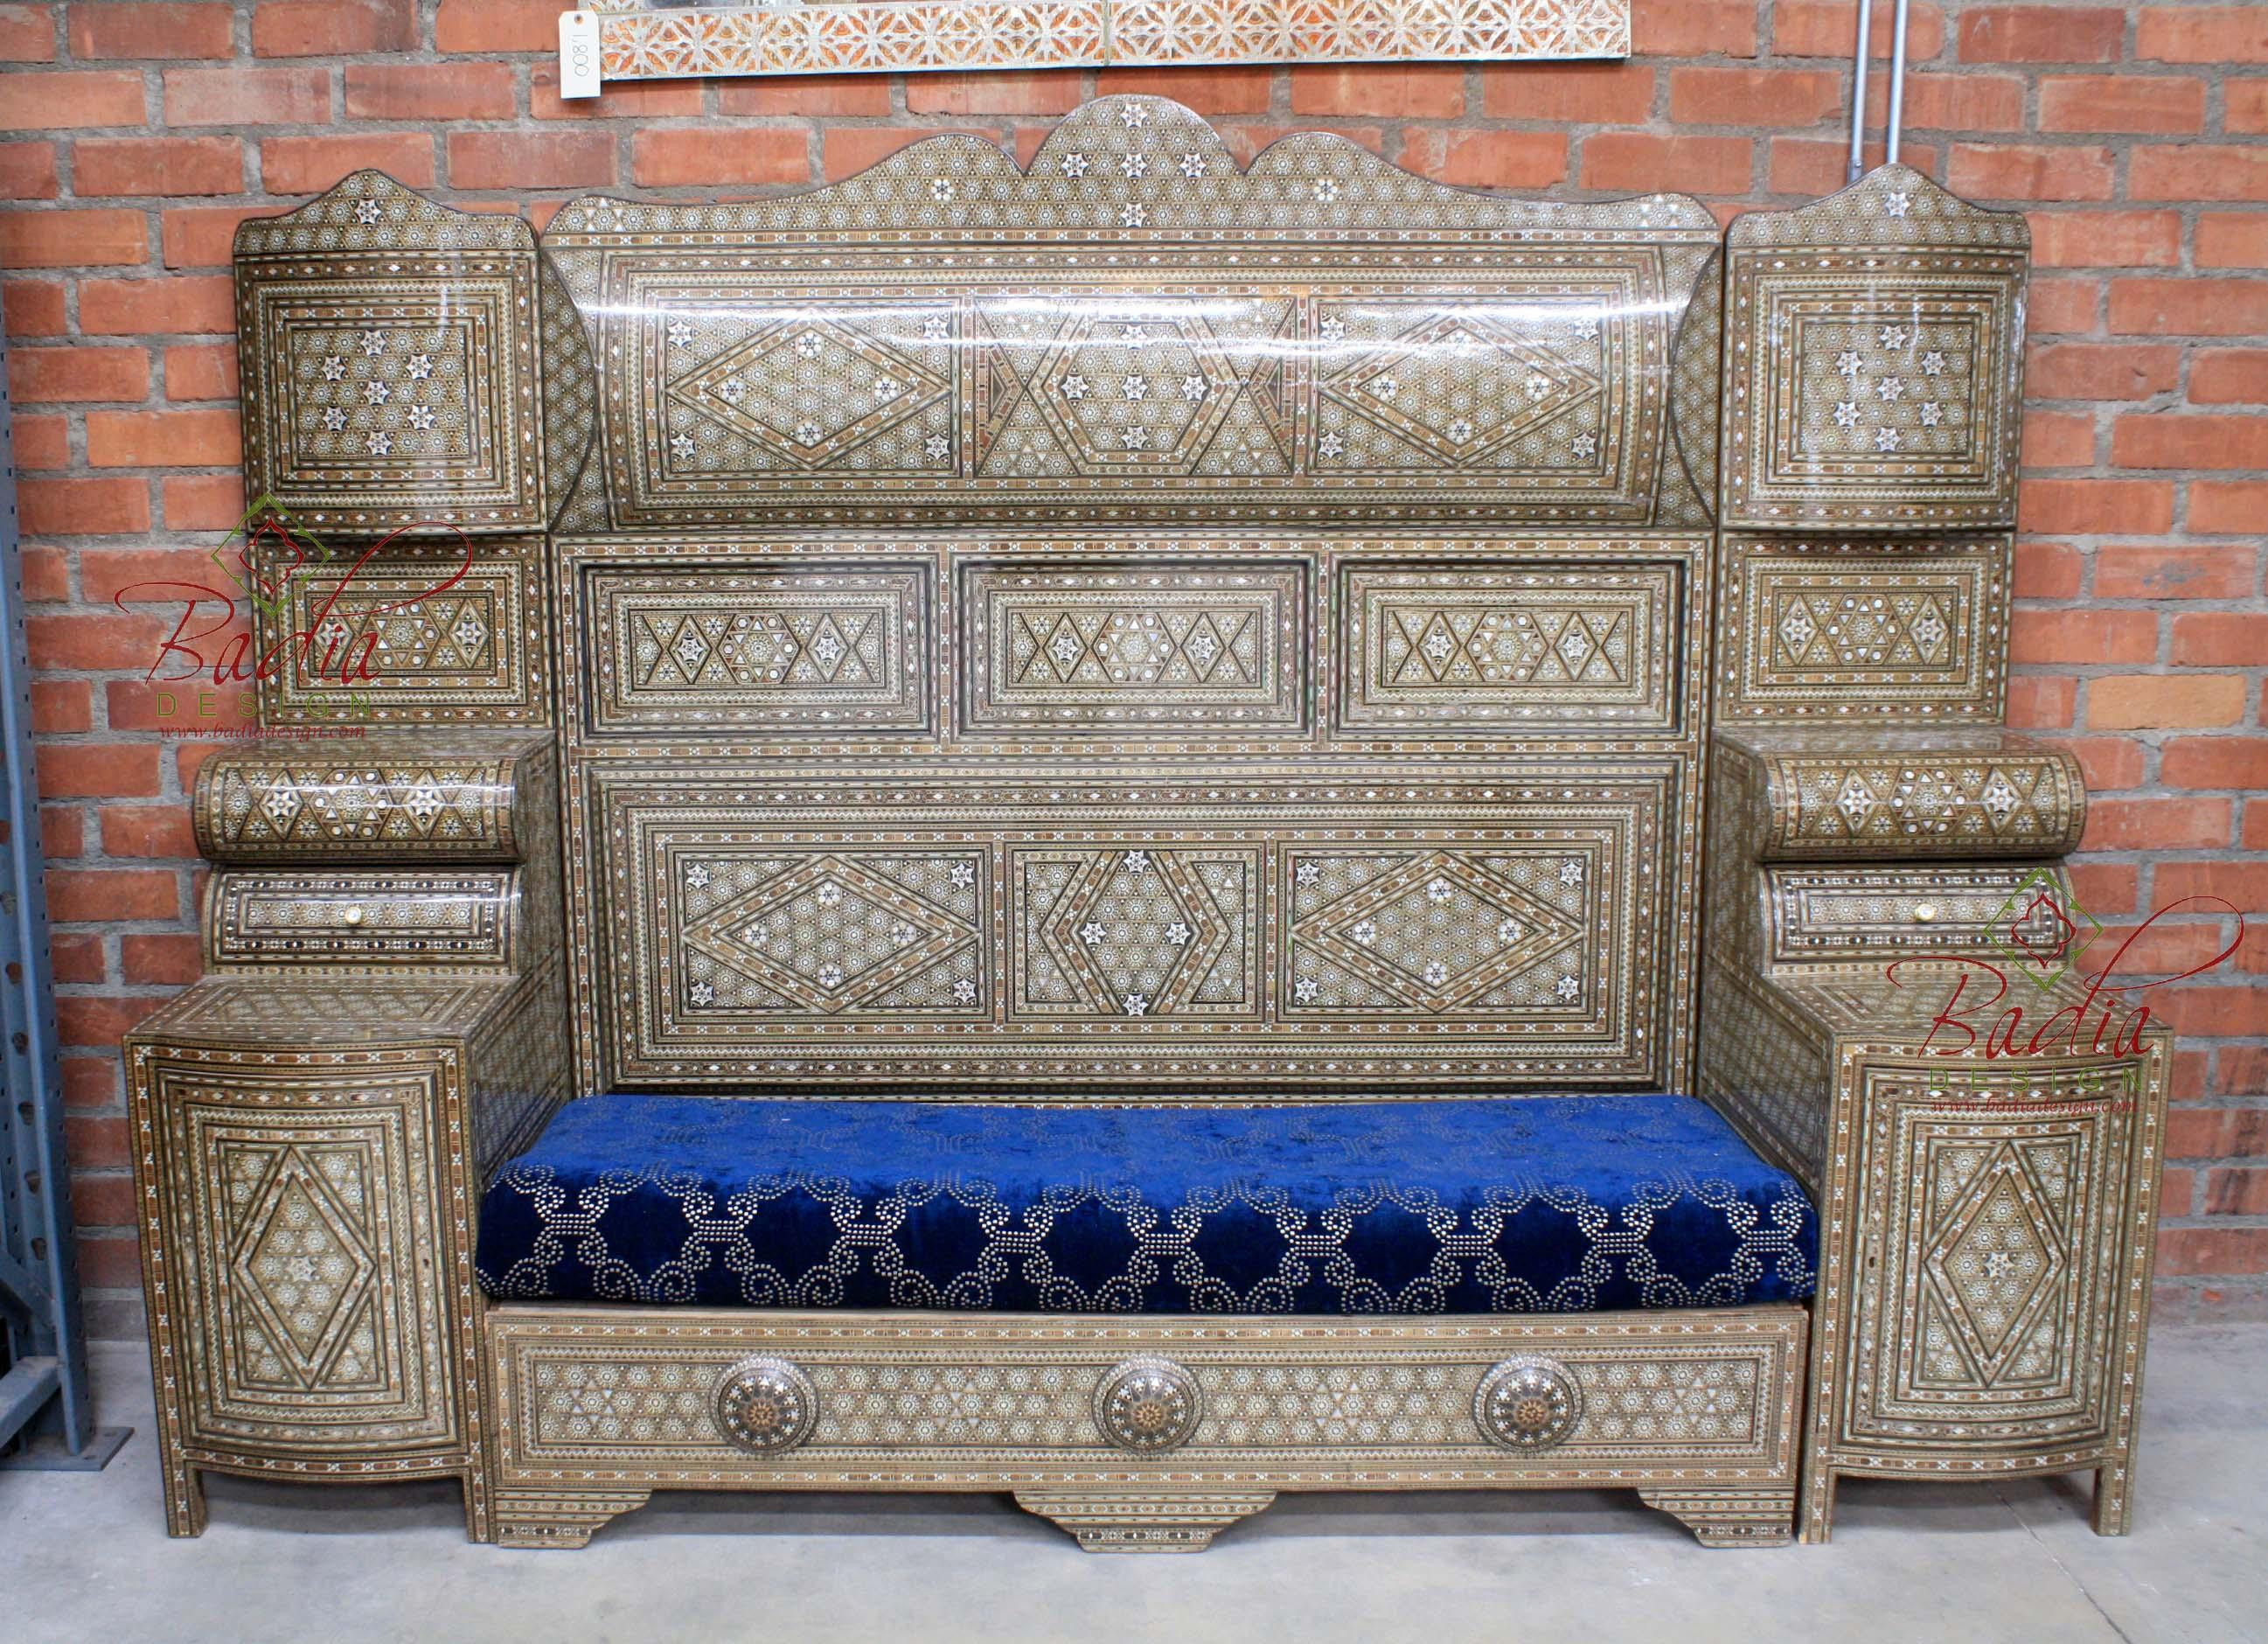 upscale-syrian-furniture-los-angeles-1.jpg